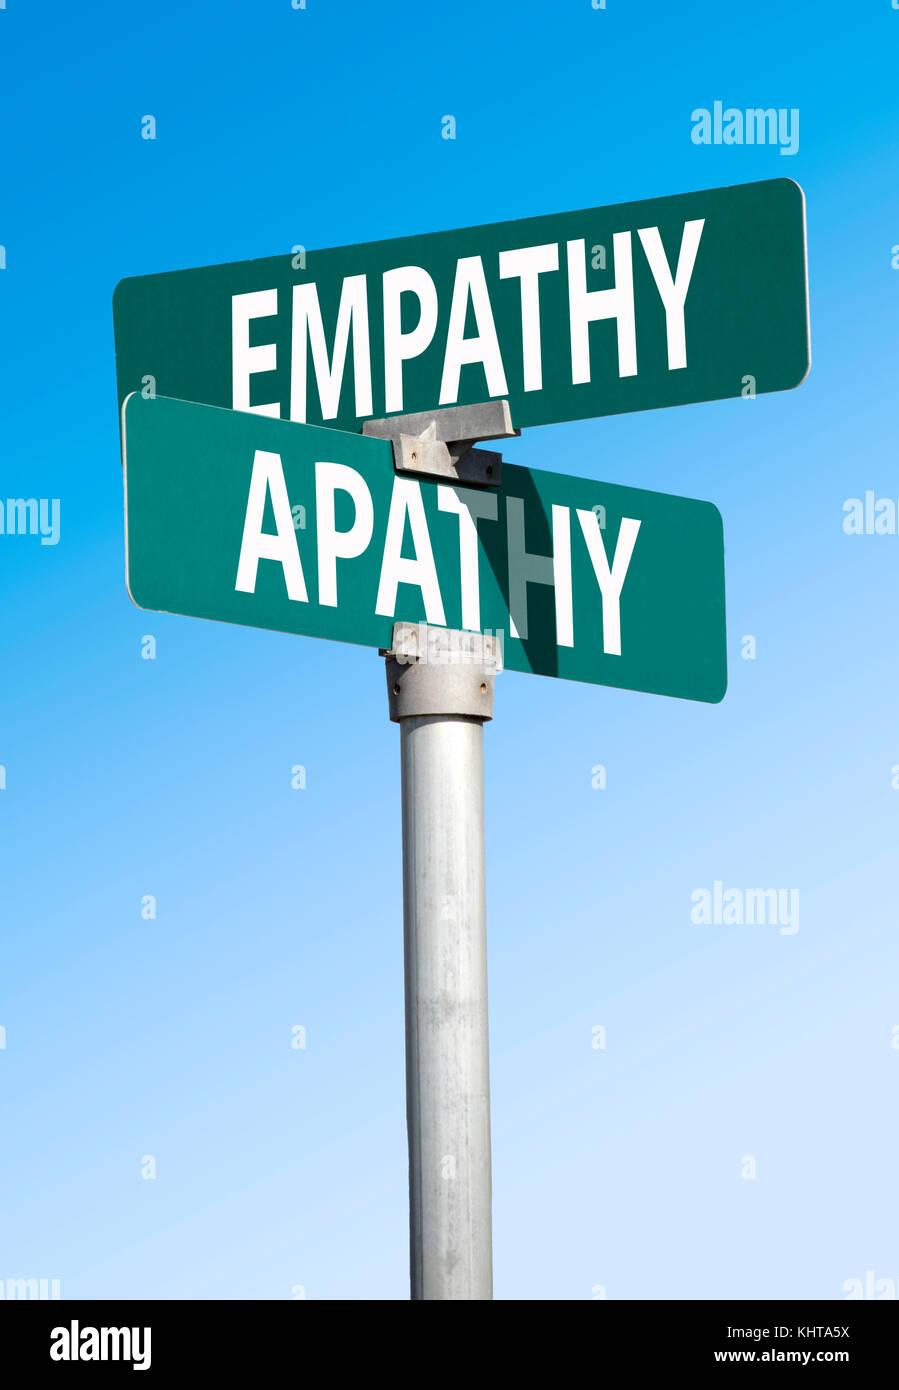 compassion and cruetly - Stock Image